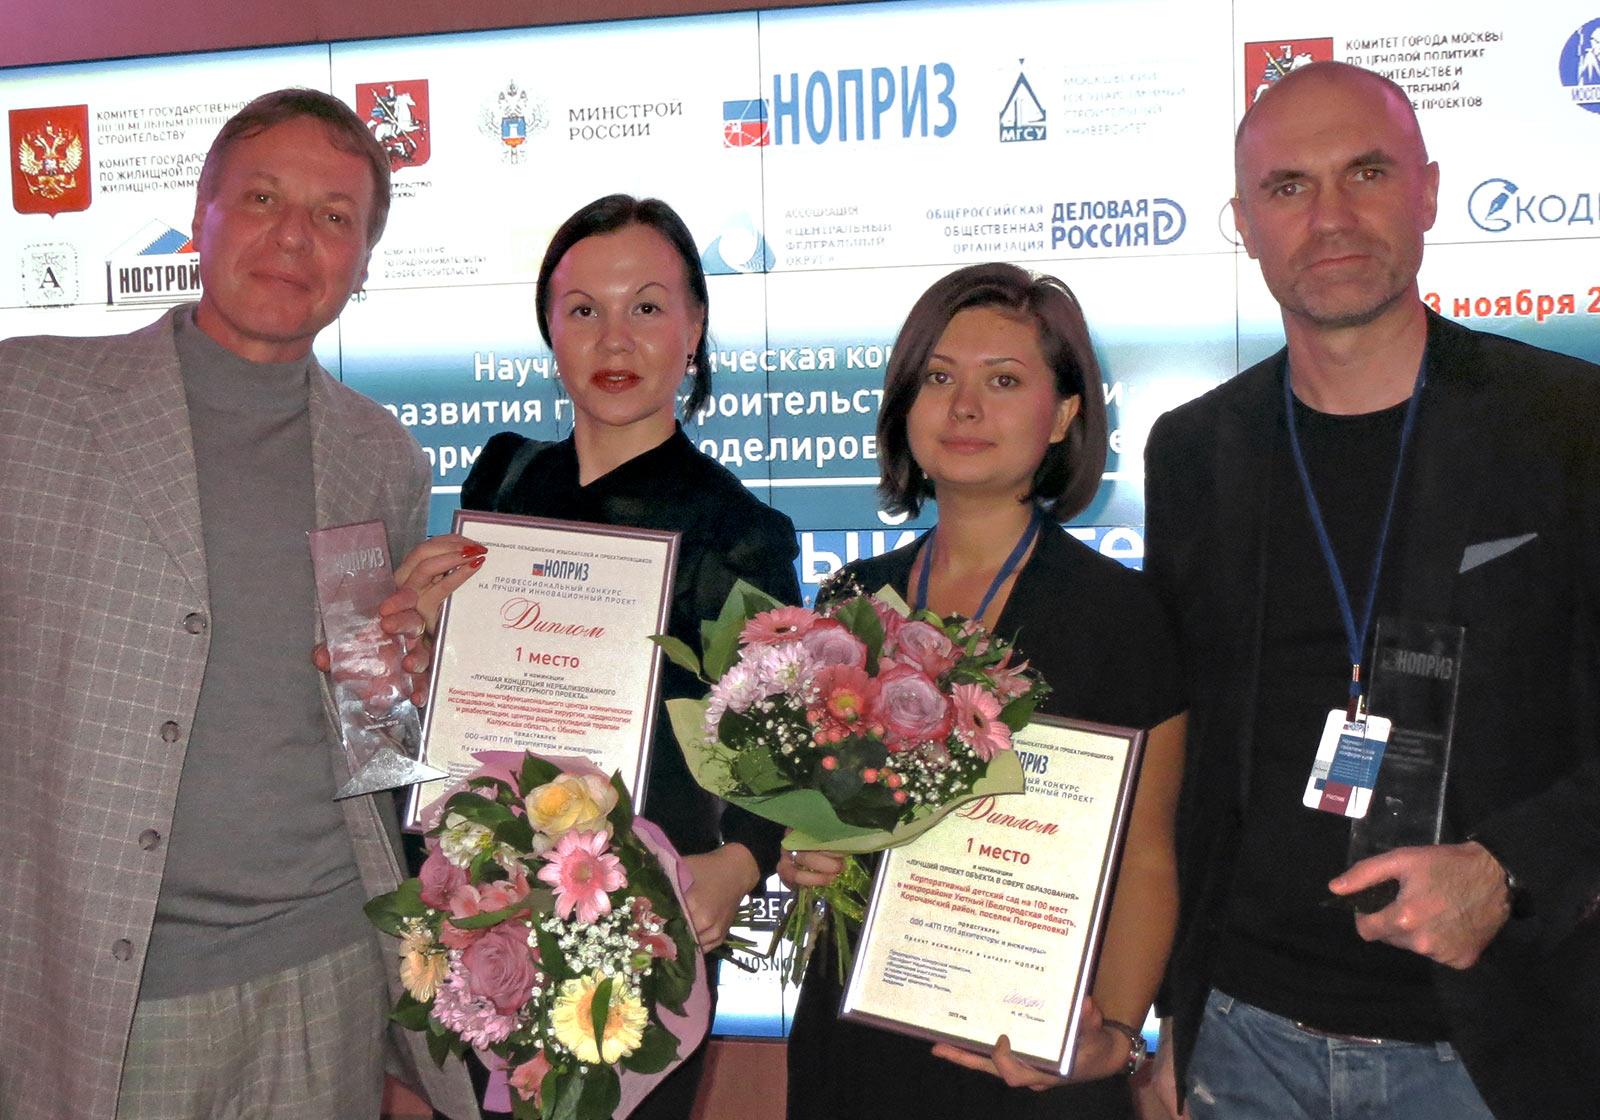 V.l.: Georg Rosen (Managing Director), Tatyana Saveleva (Business Development), Irina Kubanova (Architektin Kindergarten MIRATORG) und Head-Architekt Vadim Taranov von ATP Moskau. Foto: ATP TLP